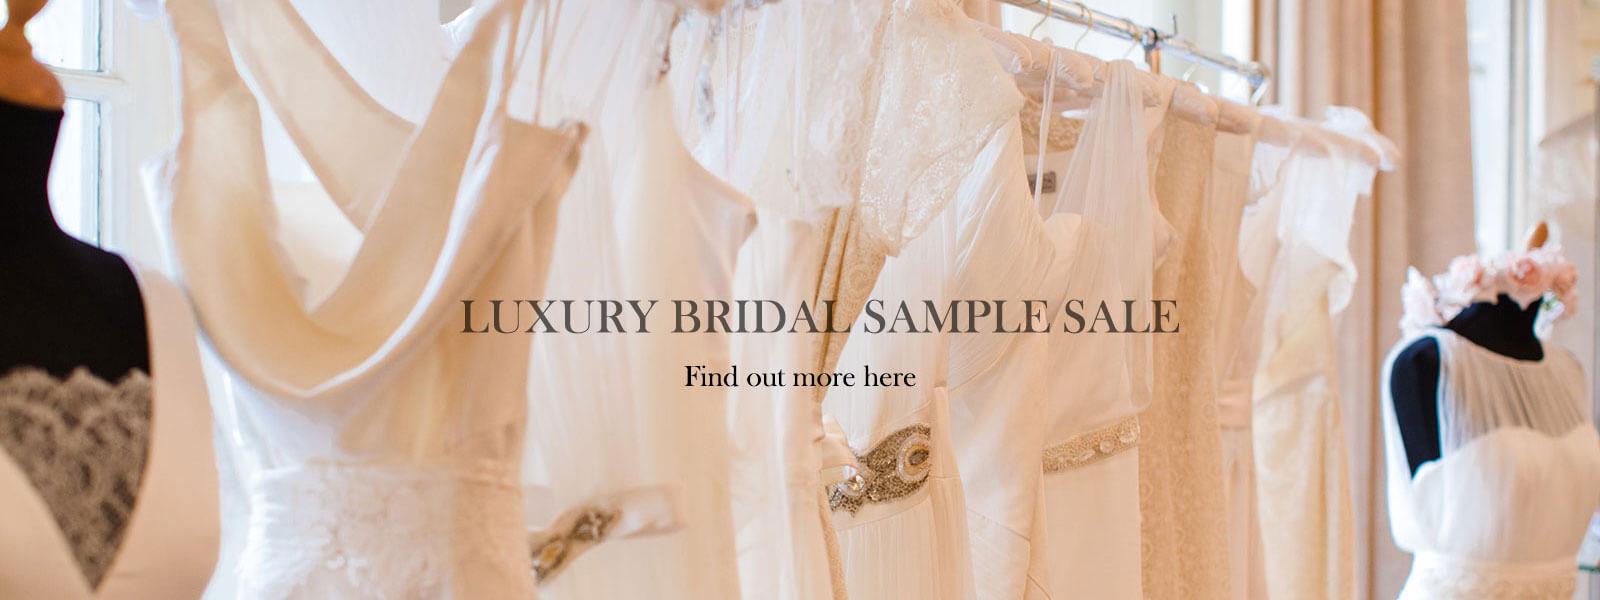 Eco Bridal Dress Designers Shop In London UK